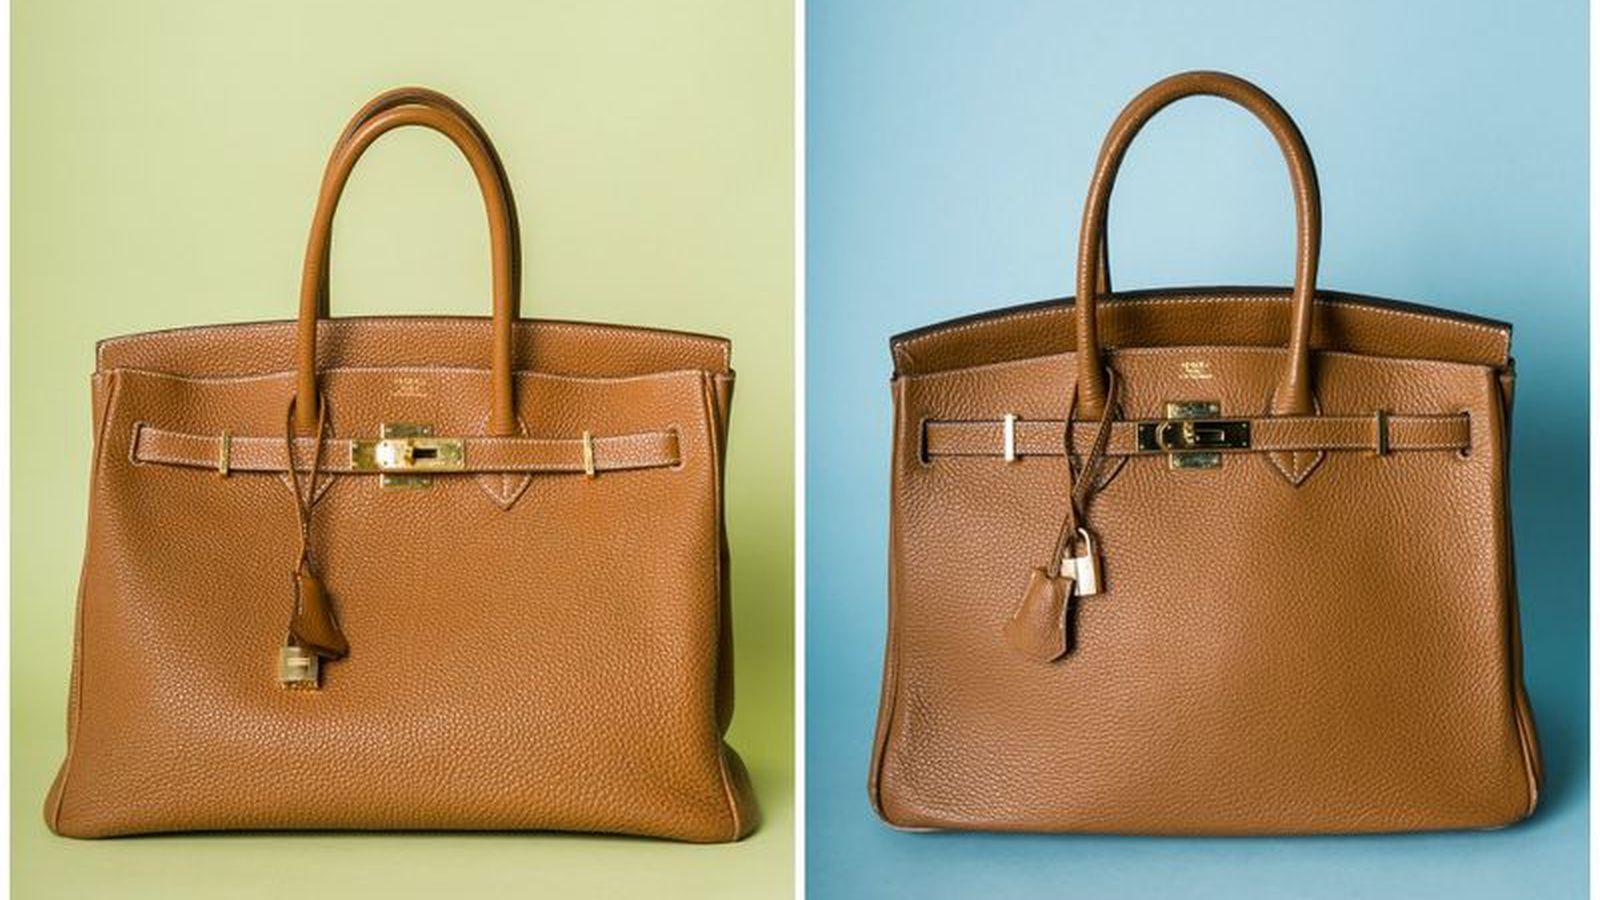 0f279f2c133 Hermes Birkin Designer Bags